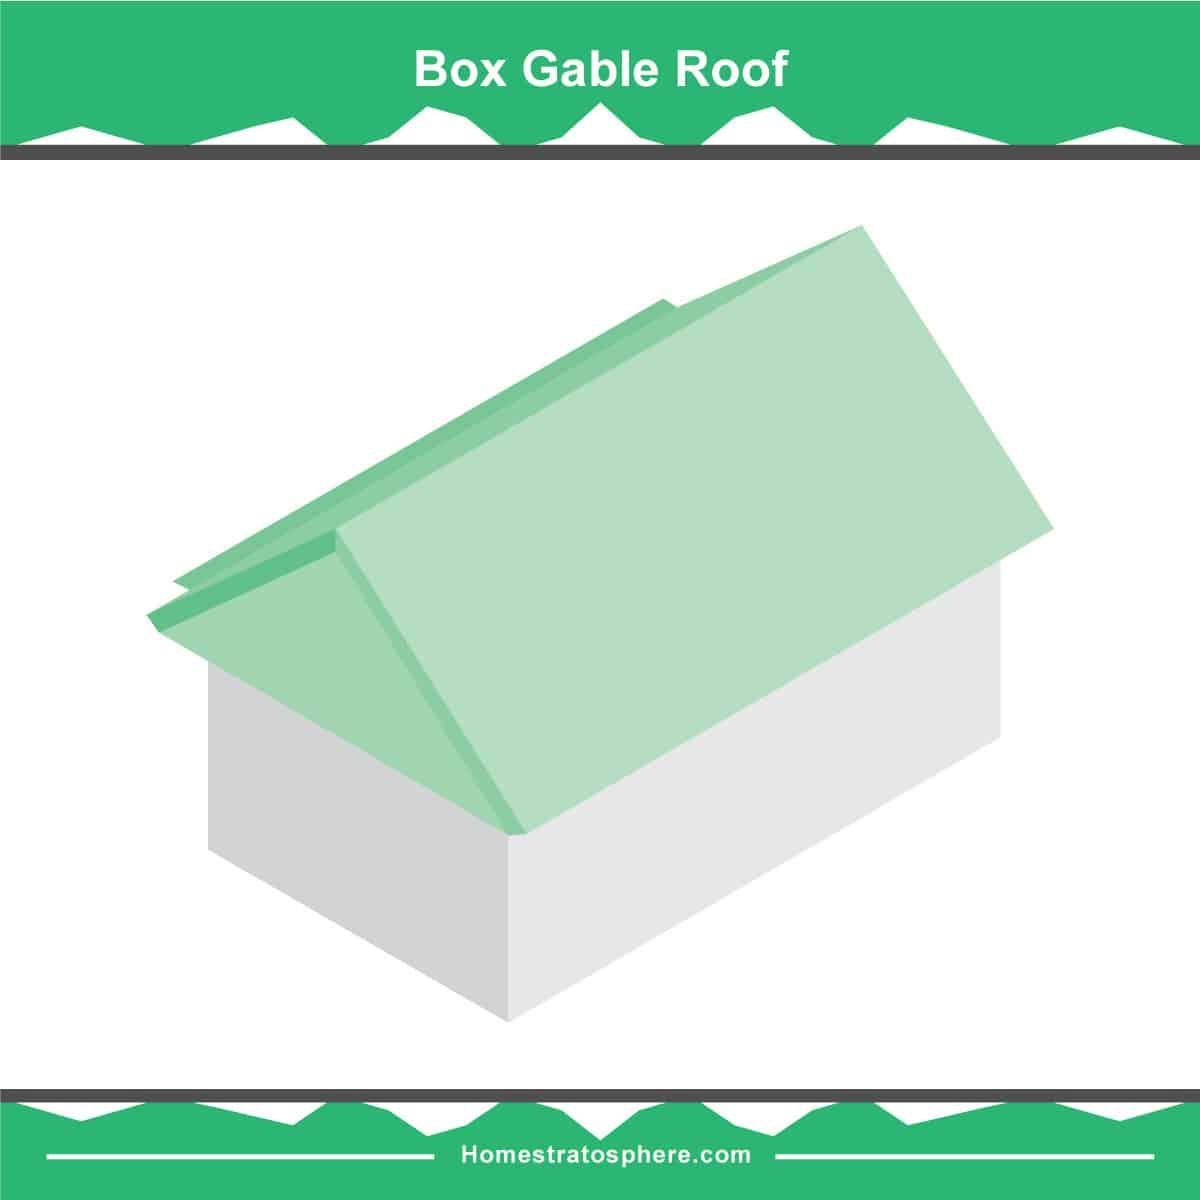 Box Gable roof diagram